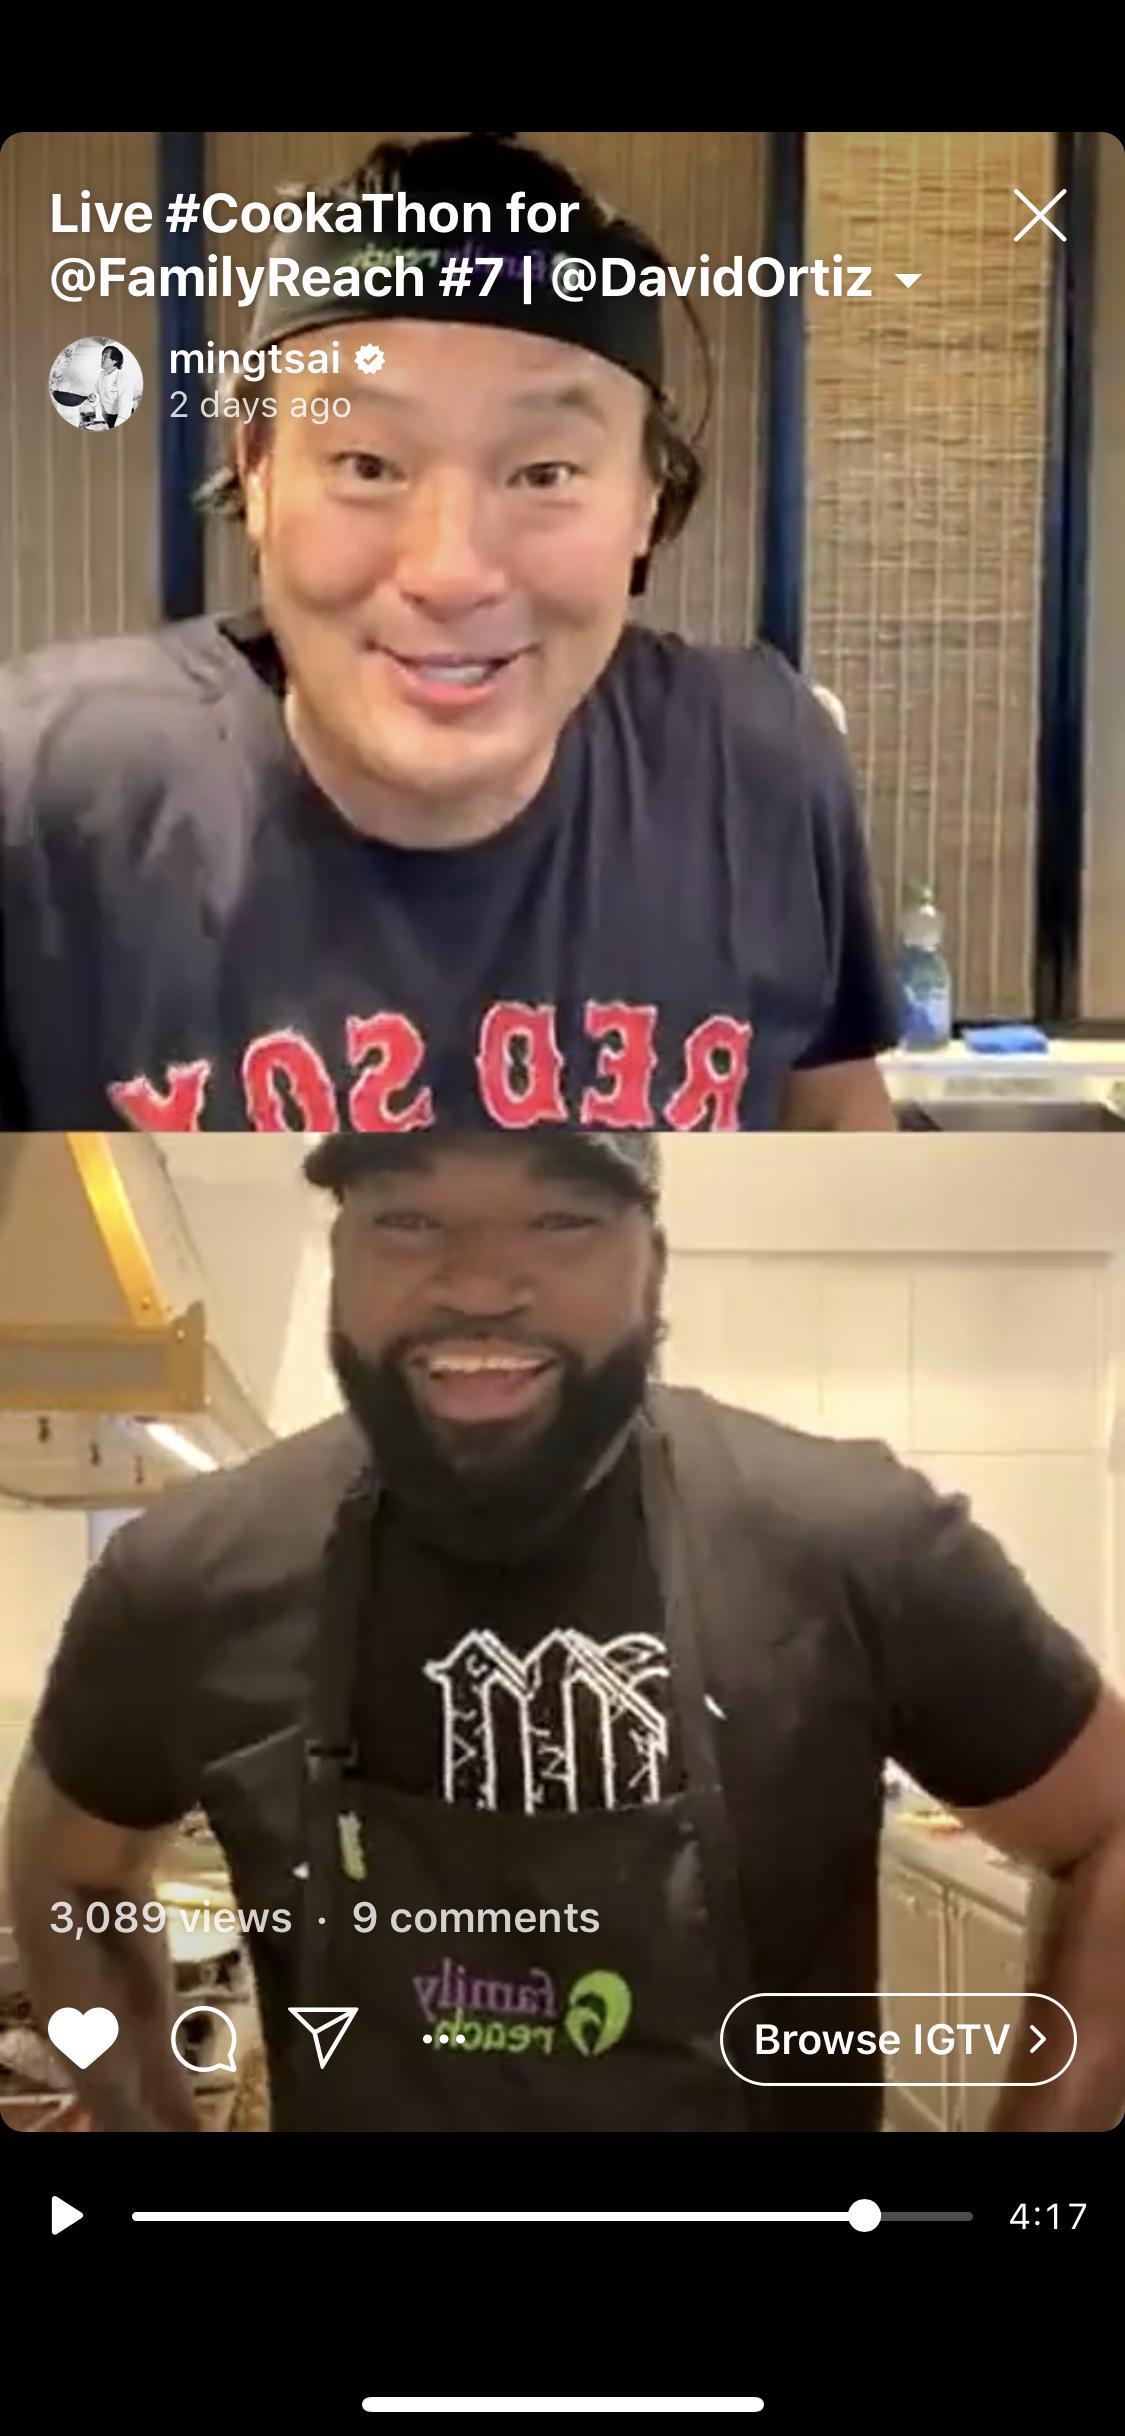 Chef Ming and David Ortiz